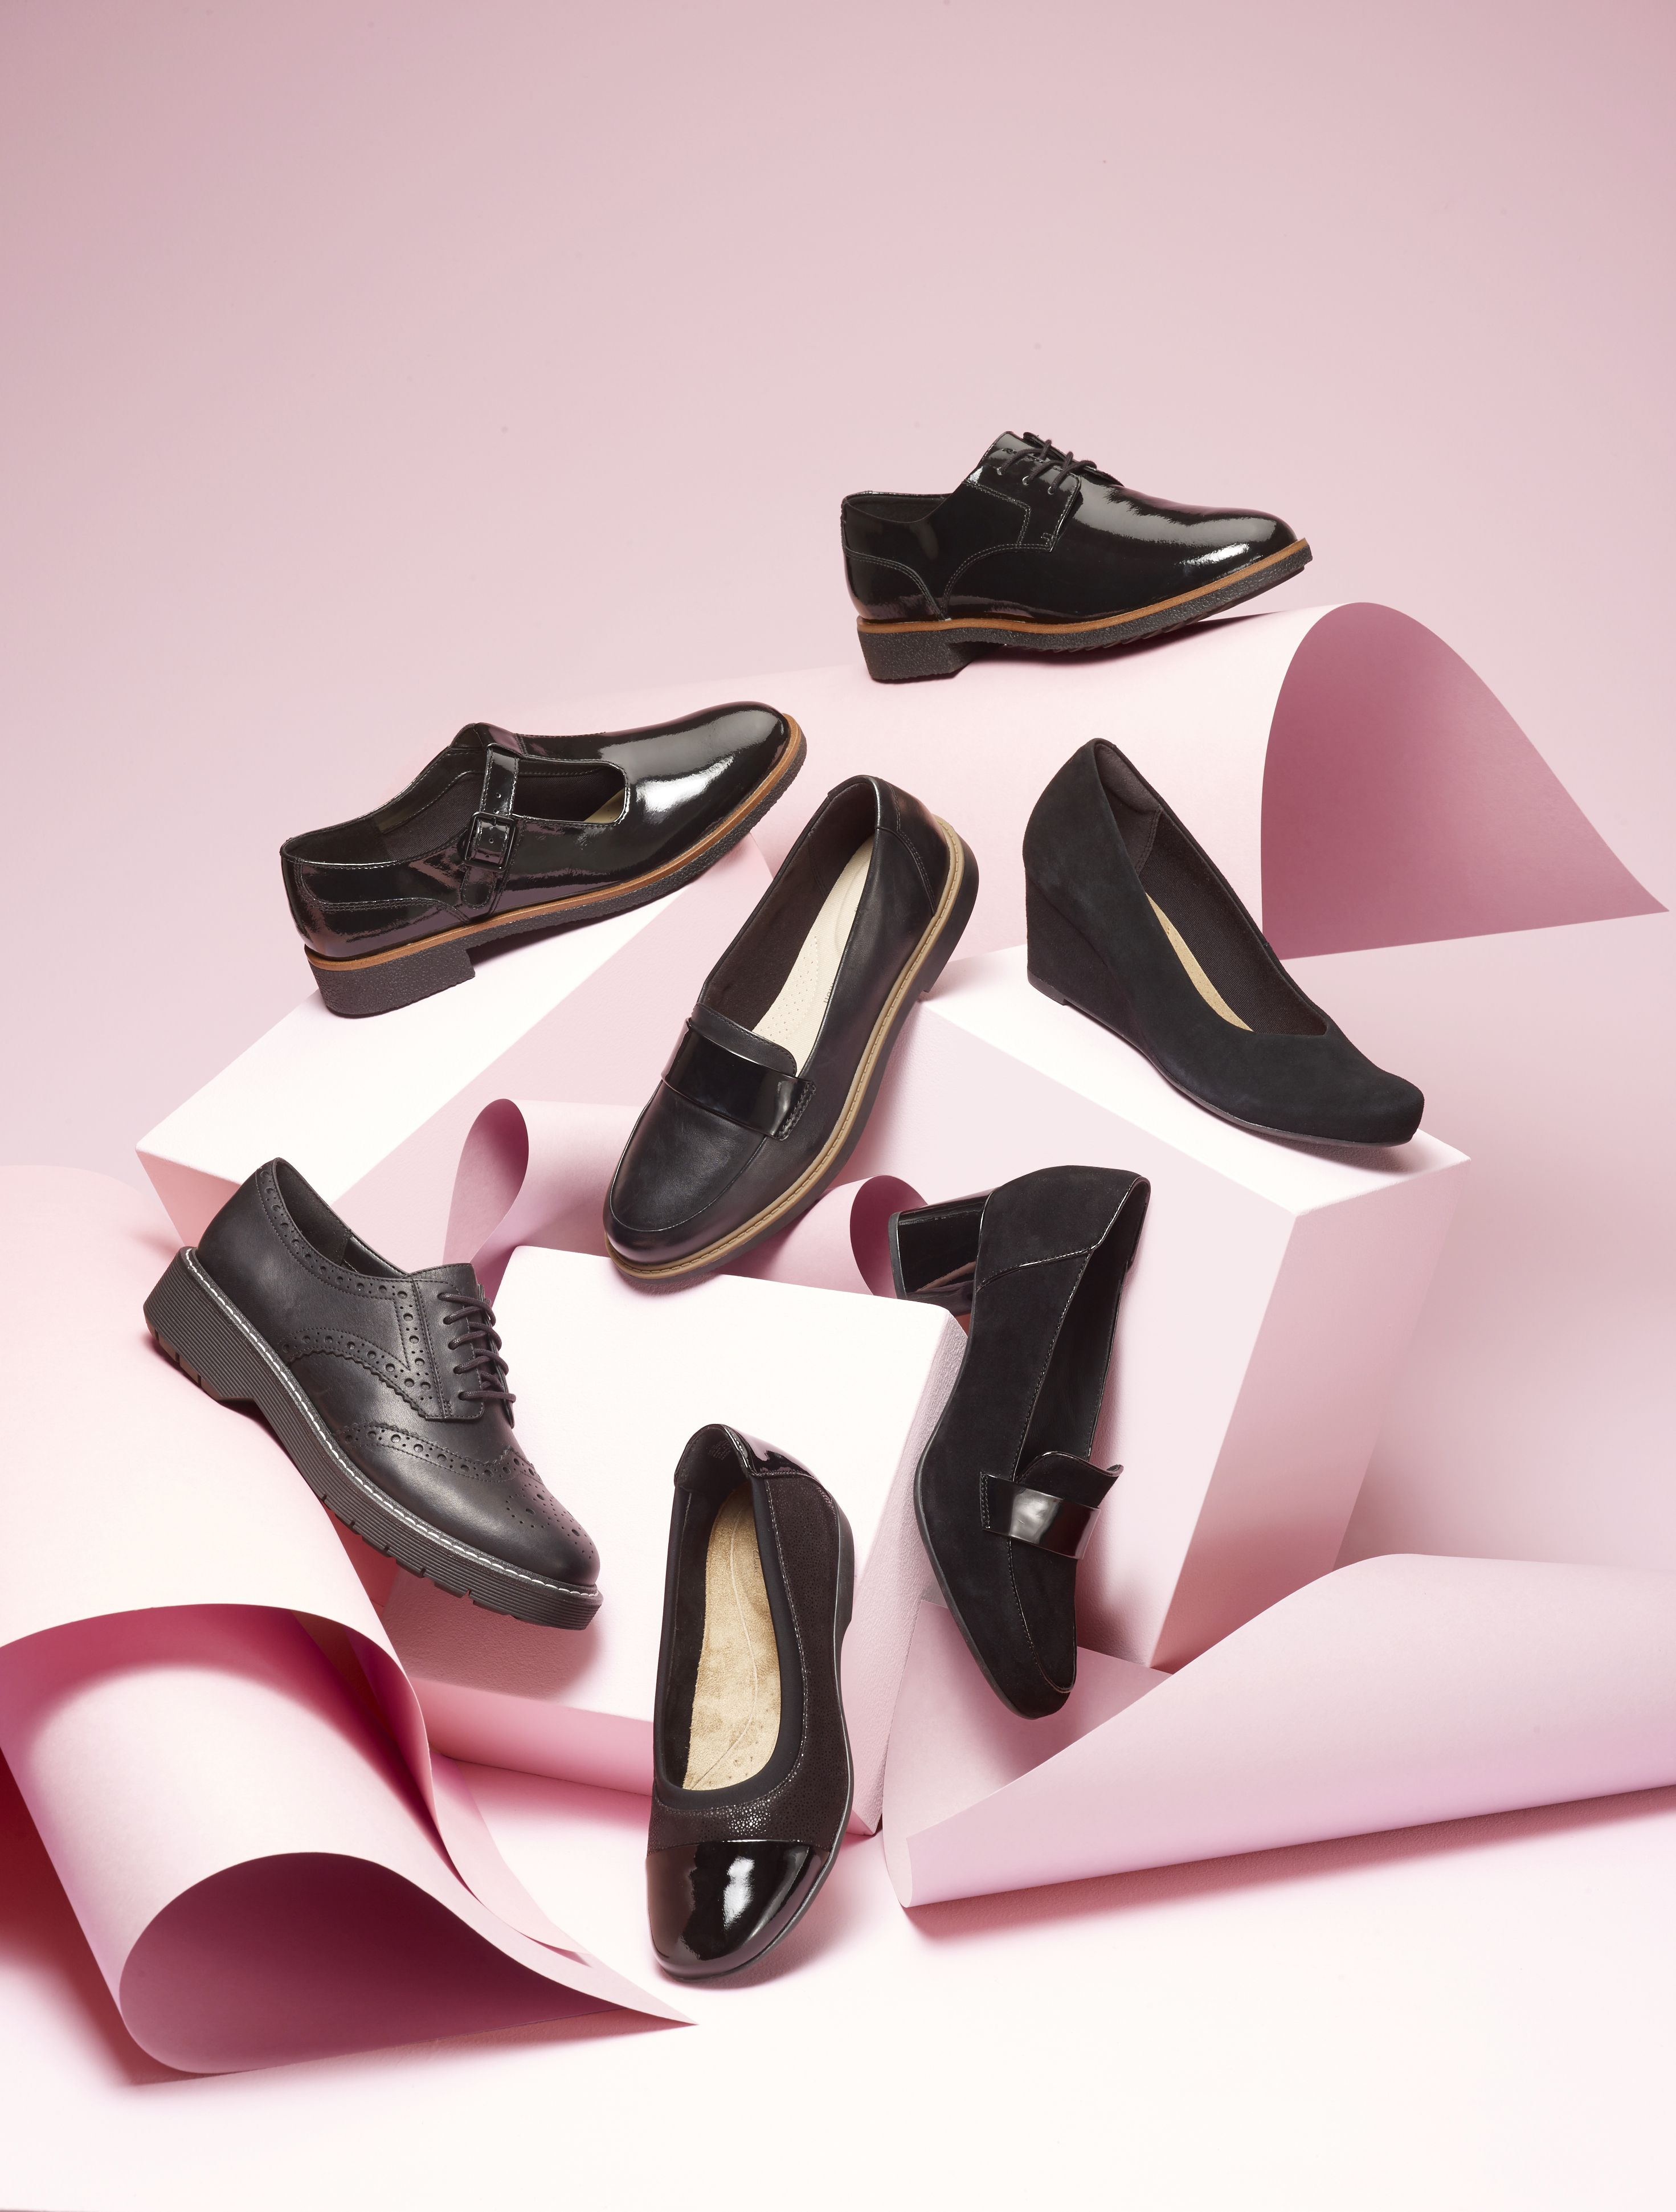 Clarks footwear still life photography for Next. | Footwear